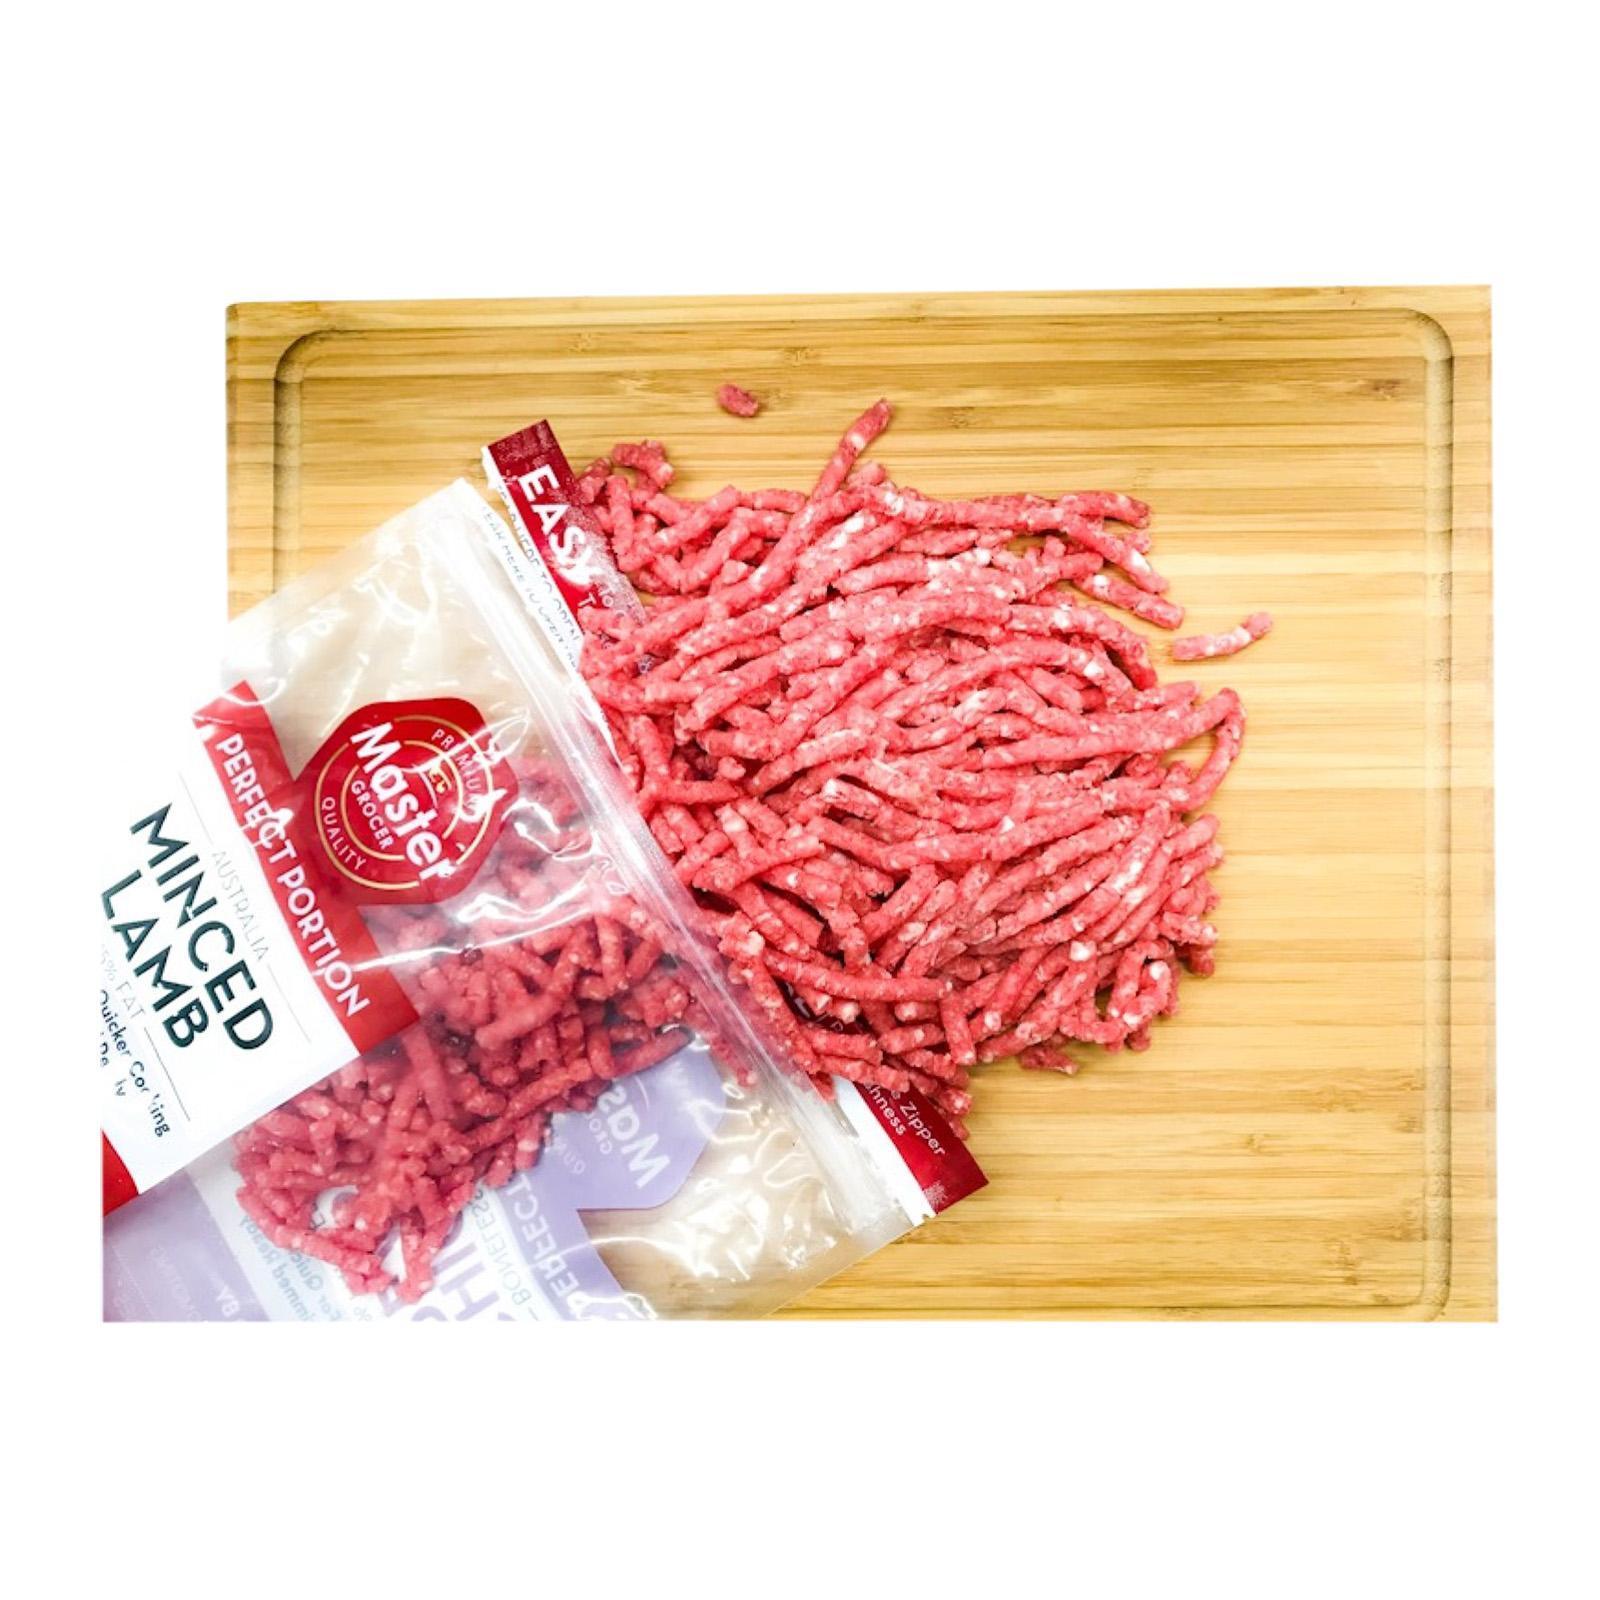 Master Grocer Australia Grassfed Lamb Minced - Frozen